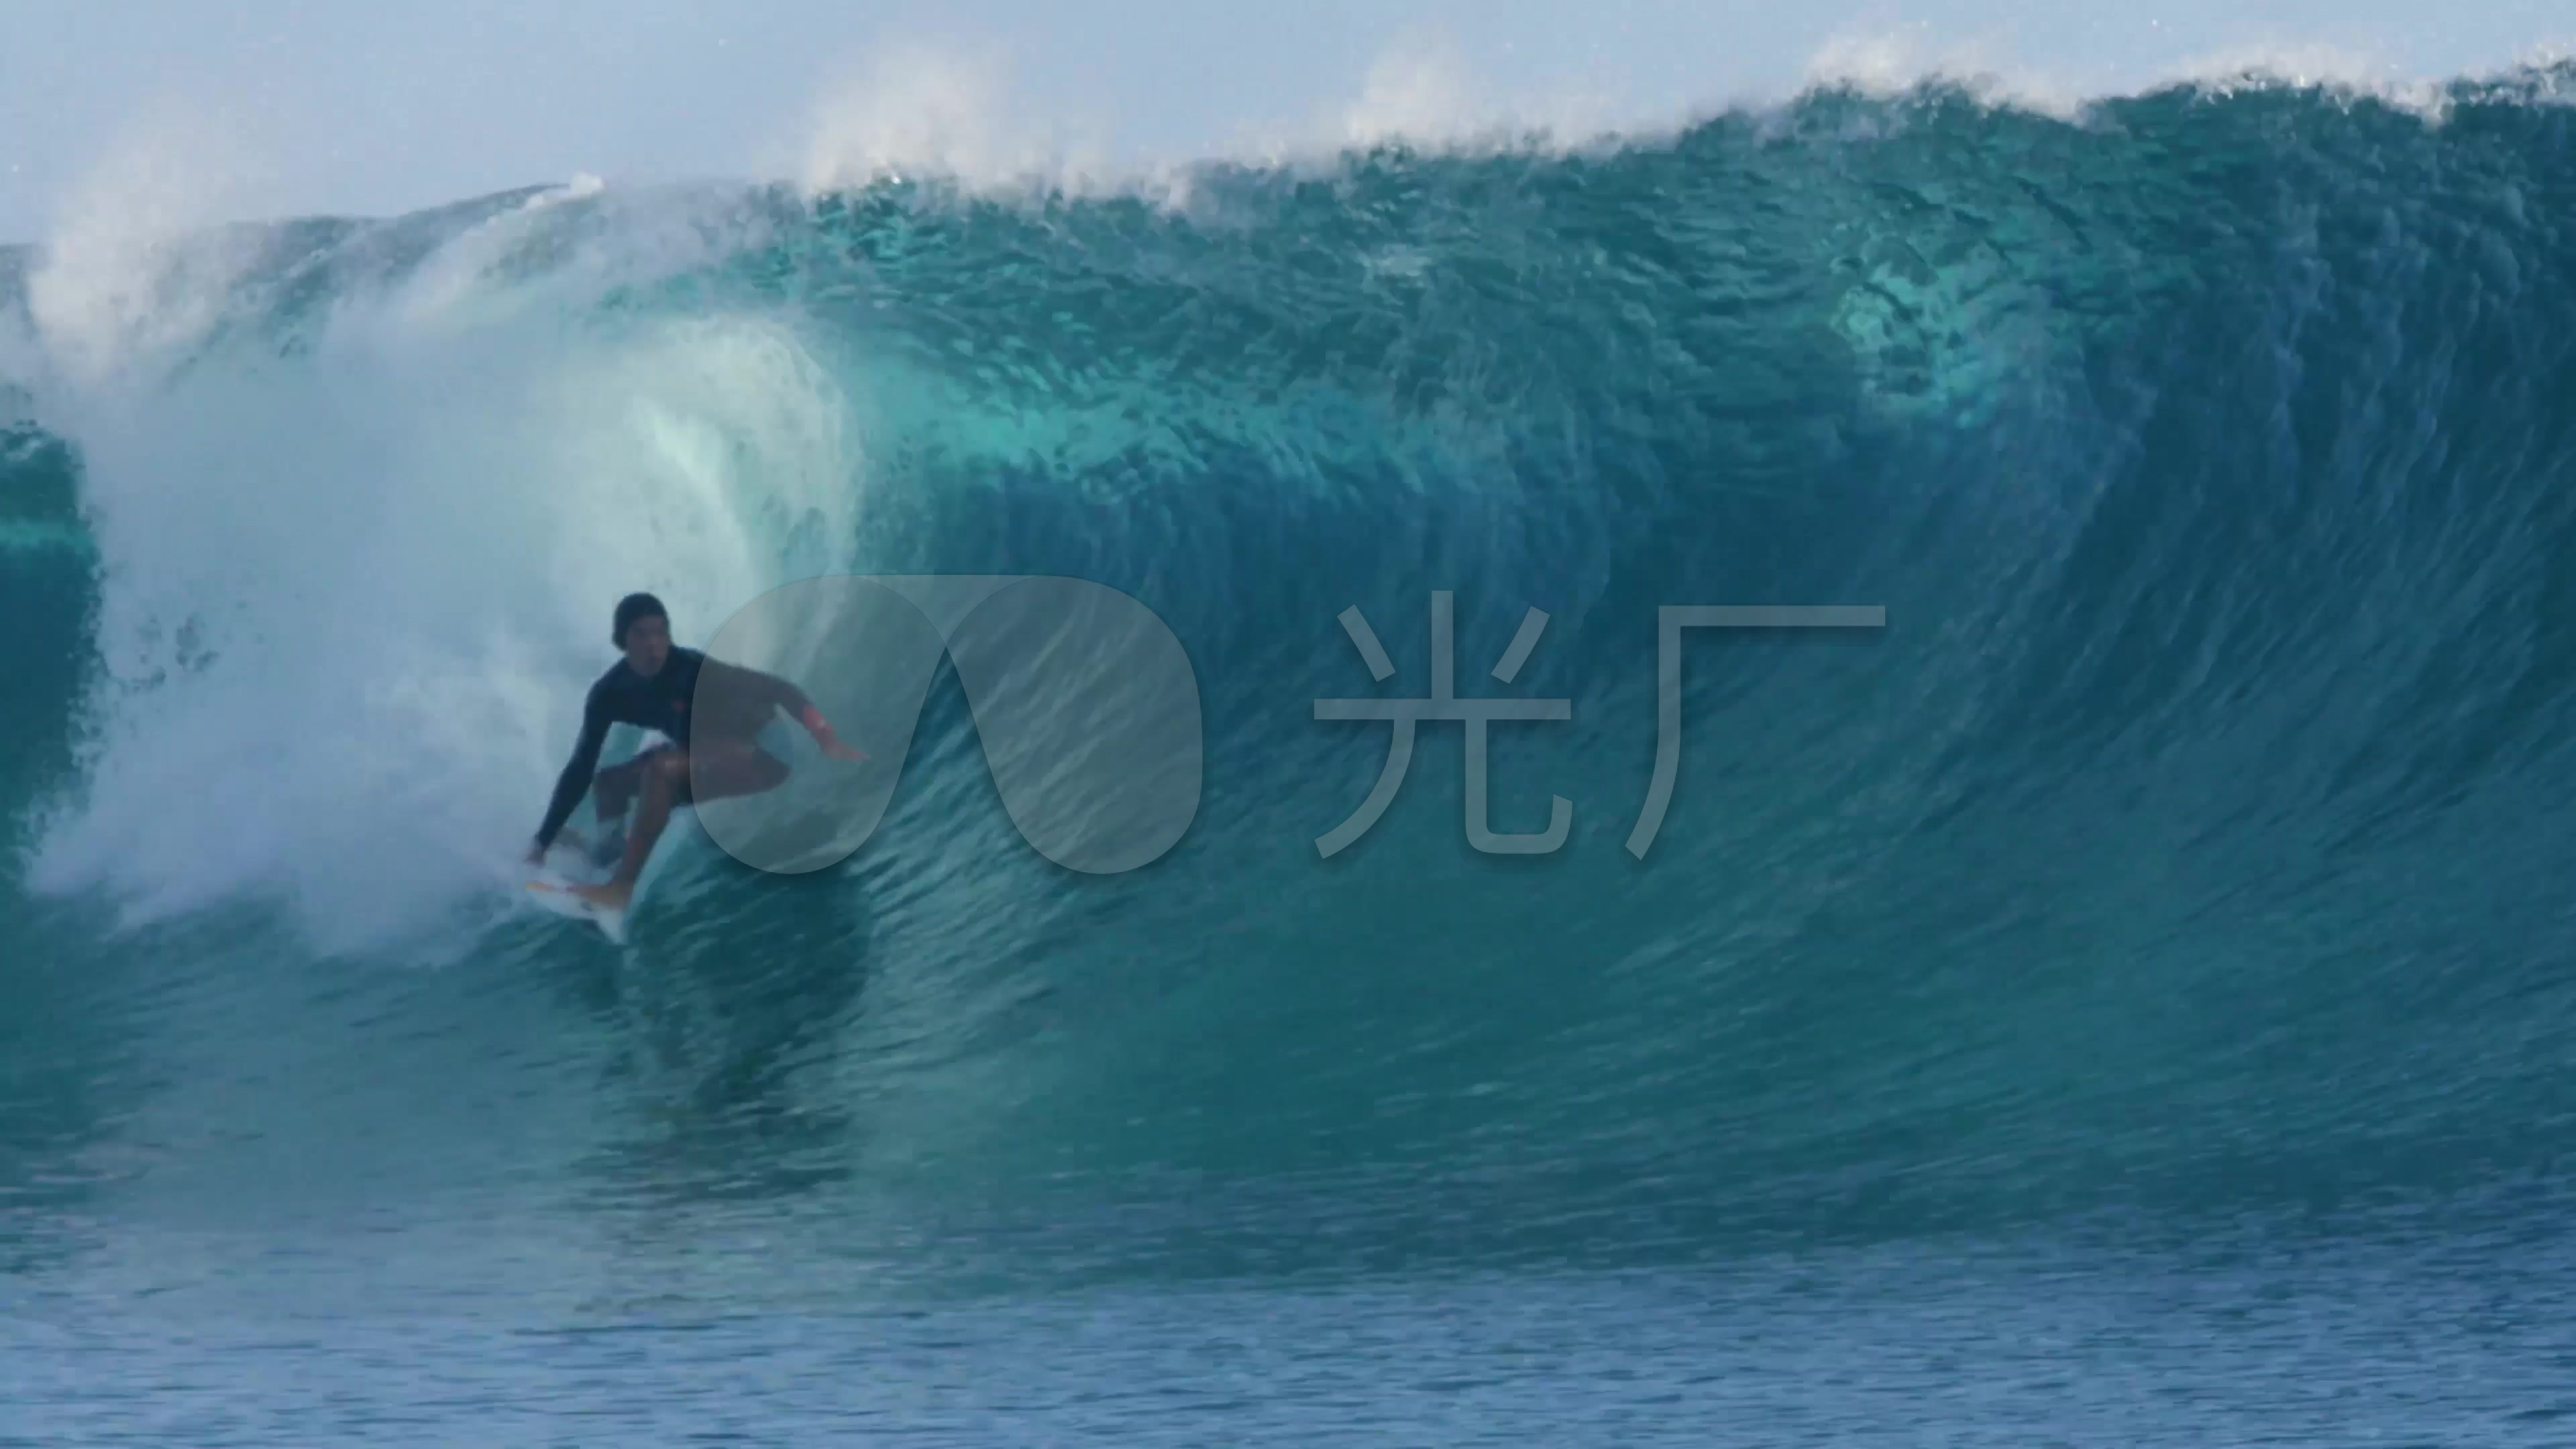 v山地山地视频滑板冲浪4K_3840X2160_高清视摩托汤解析热不图片